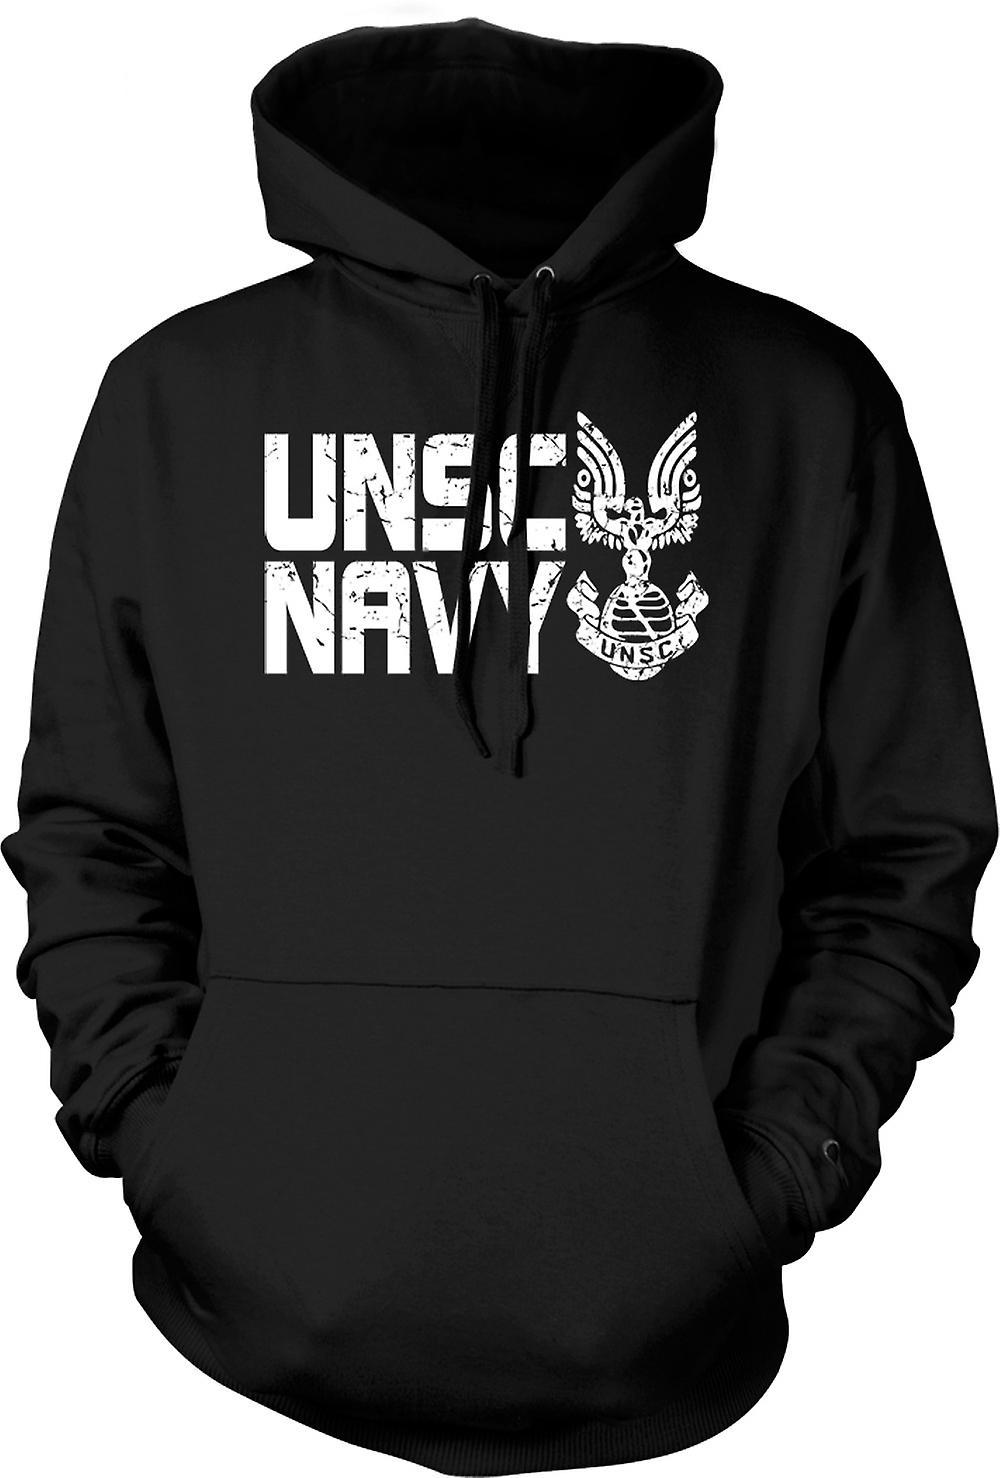 Mens Hoodie - FN: s säkerhetsråd Navy Logo - Gamer